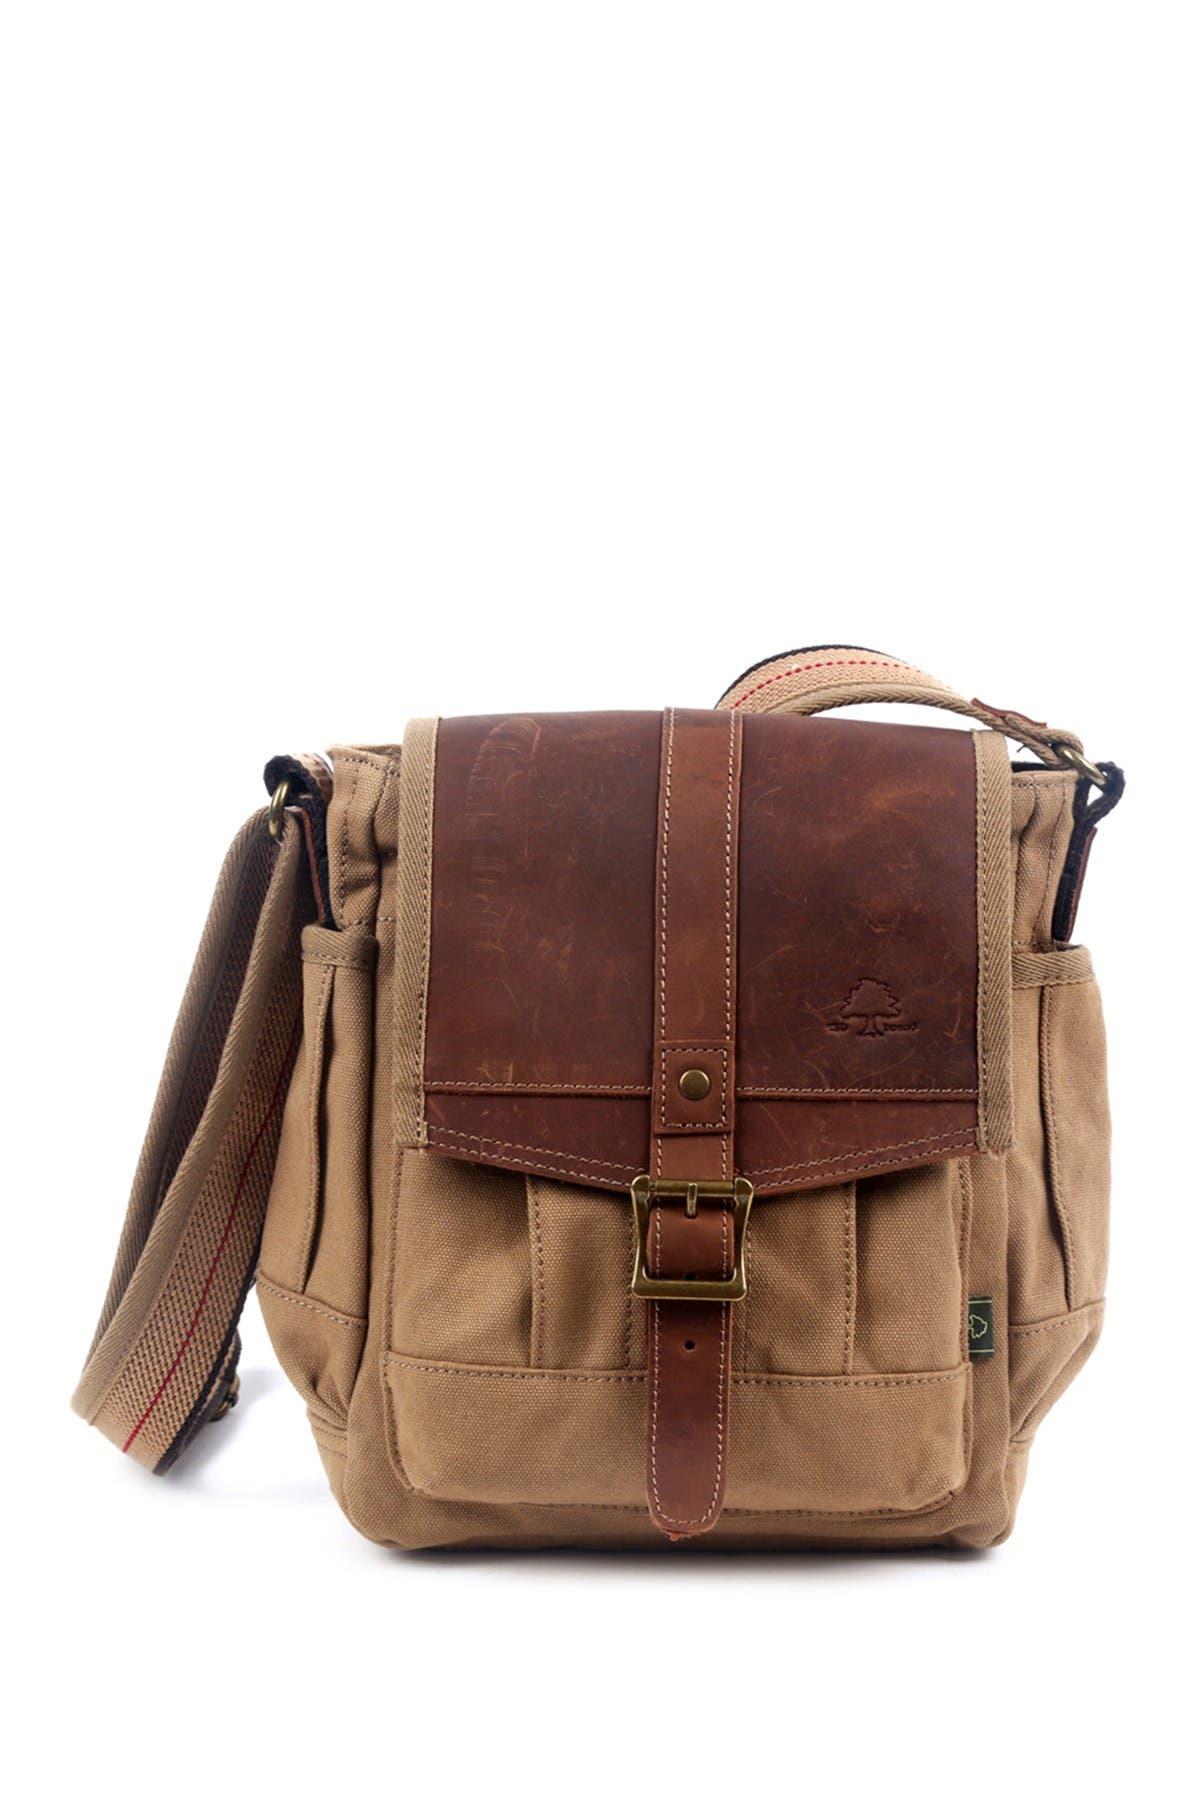 Image of TSD Turtle Ridge Canvas Crossbody Bag